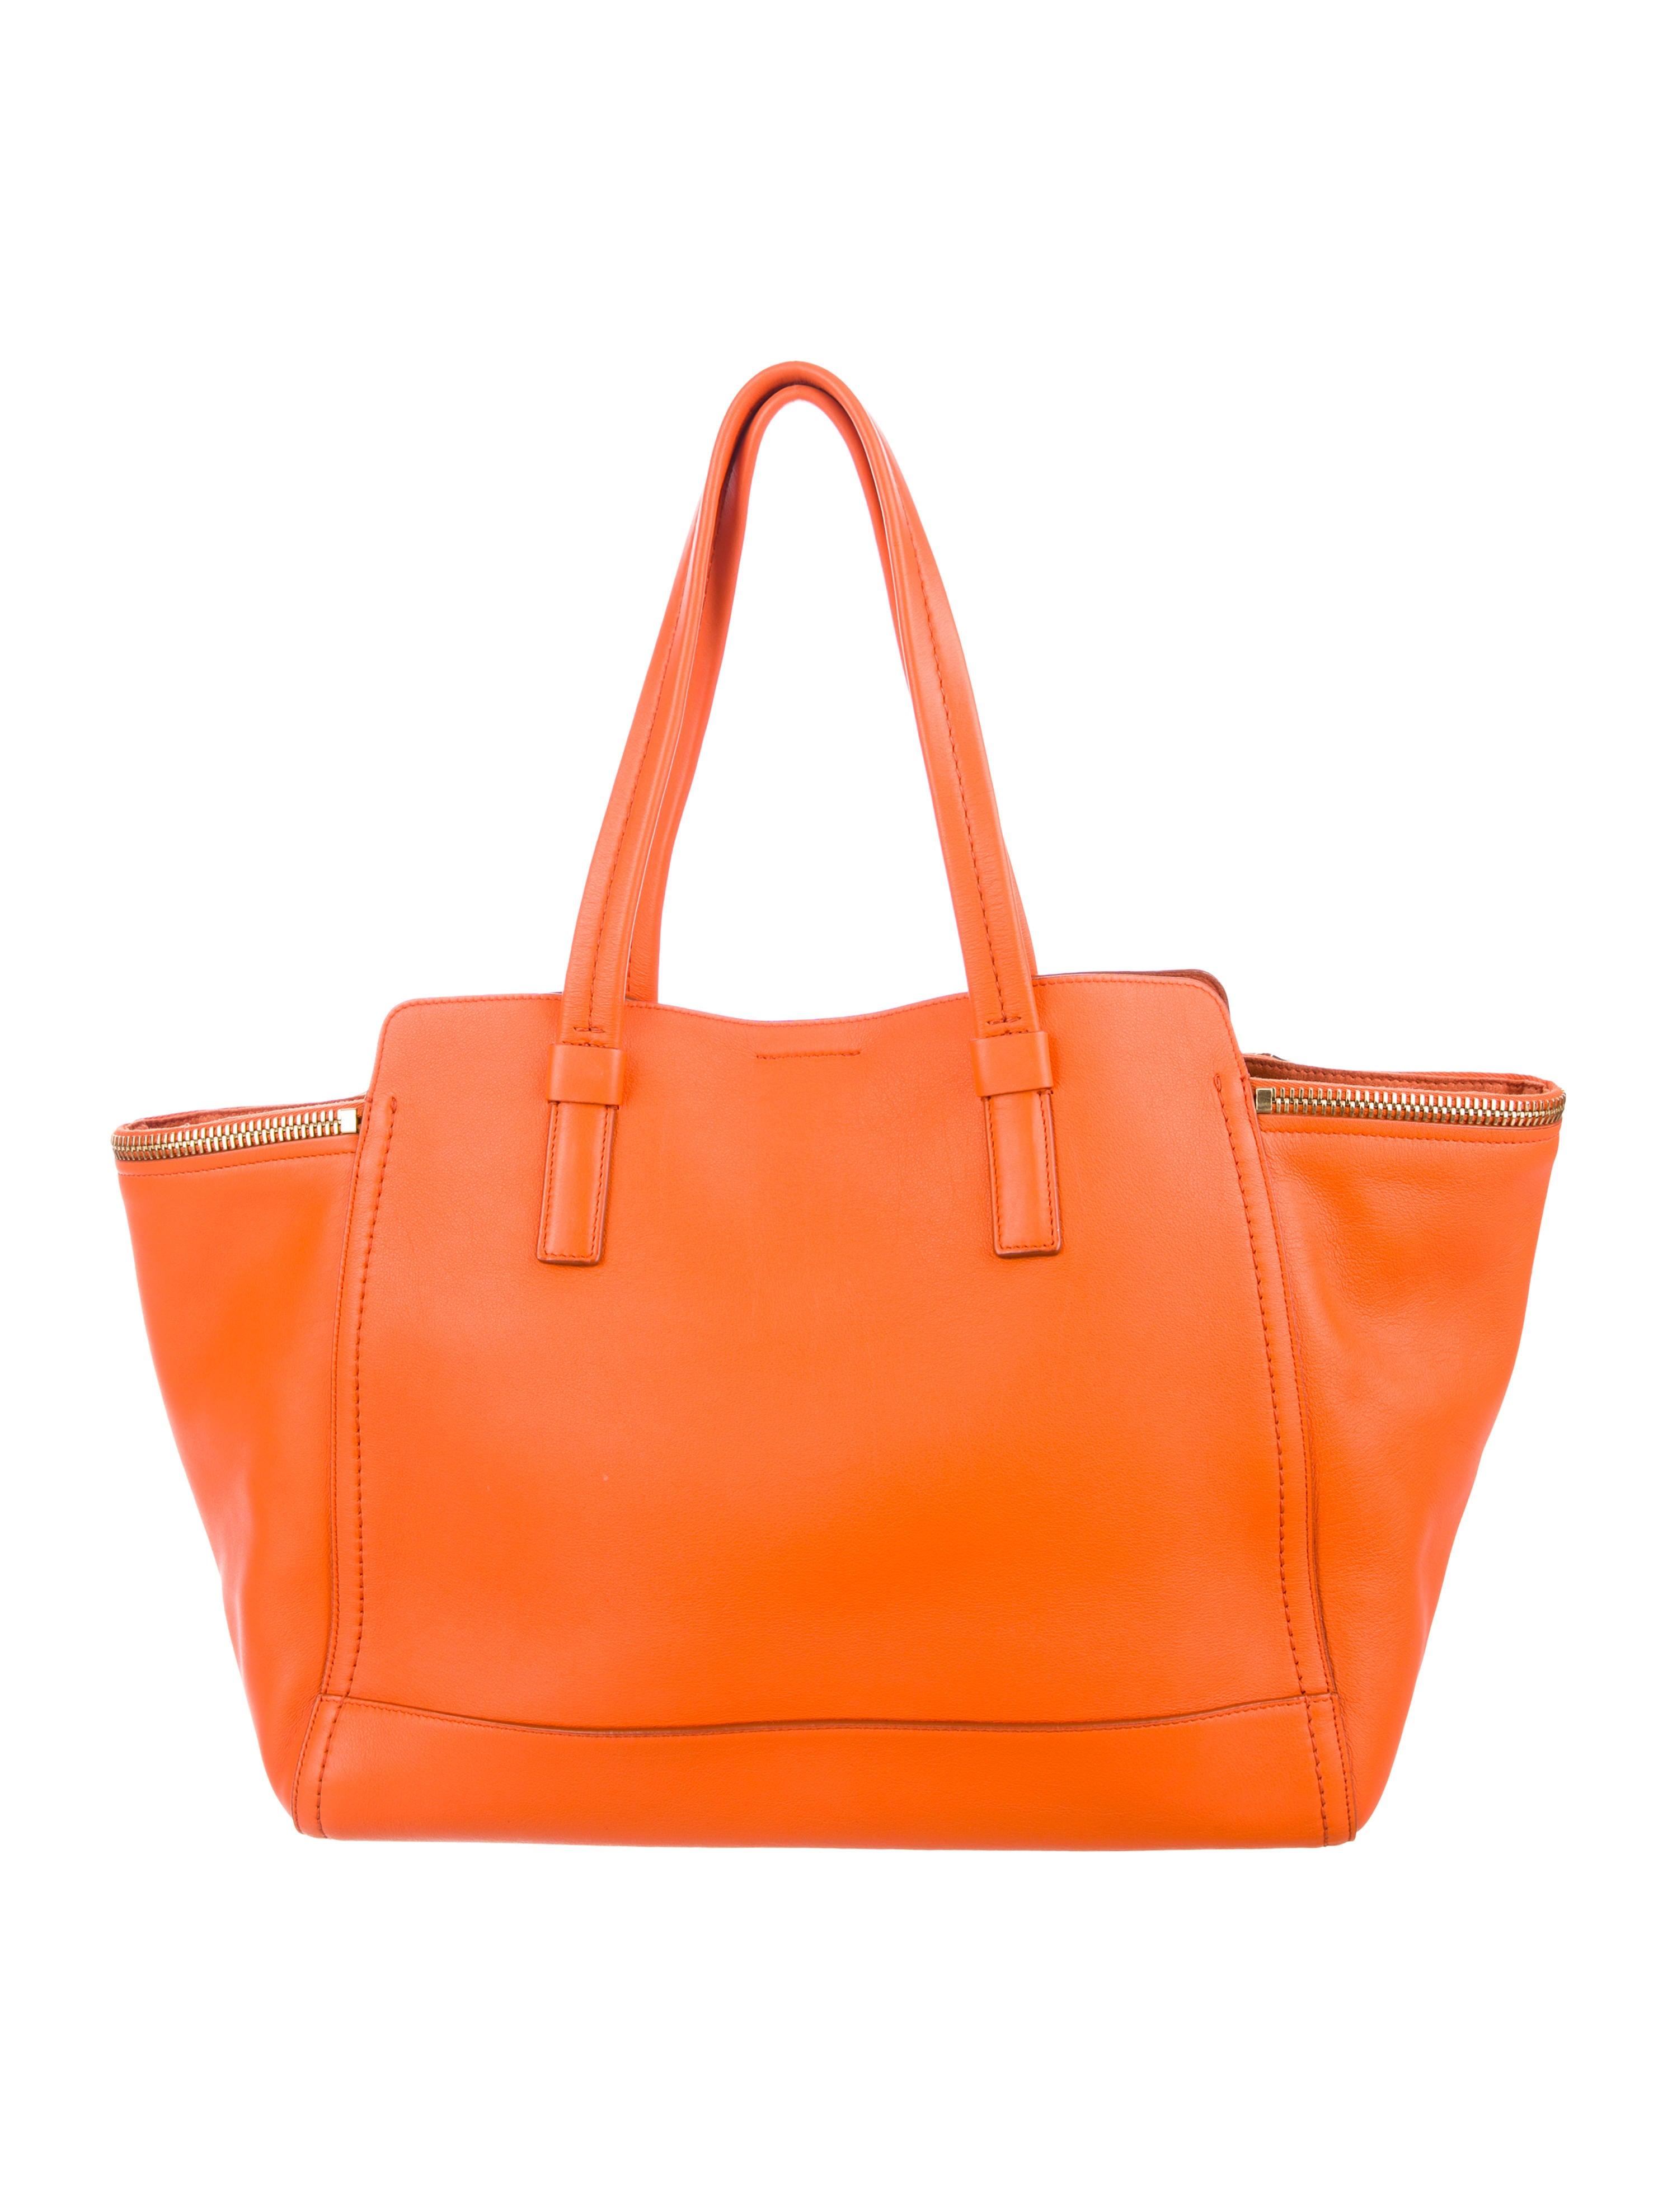 Salvatore Ferragamo Large Verve Bag - Handbags - SAL74044  e37f4c81bb9e0